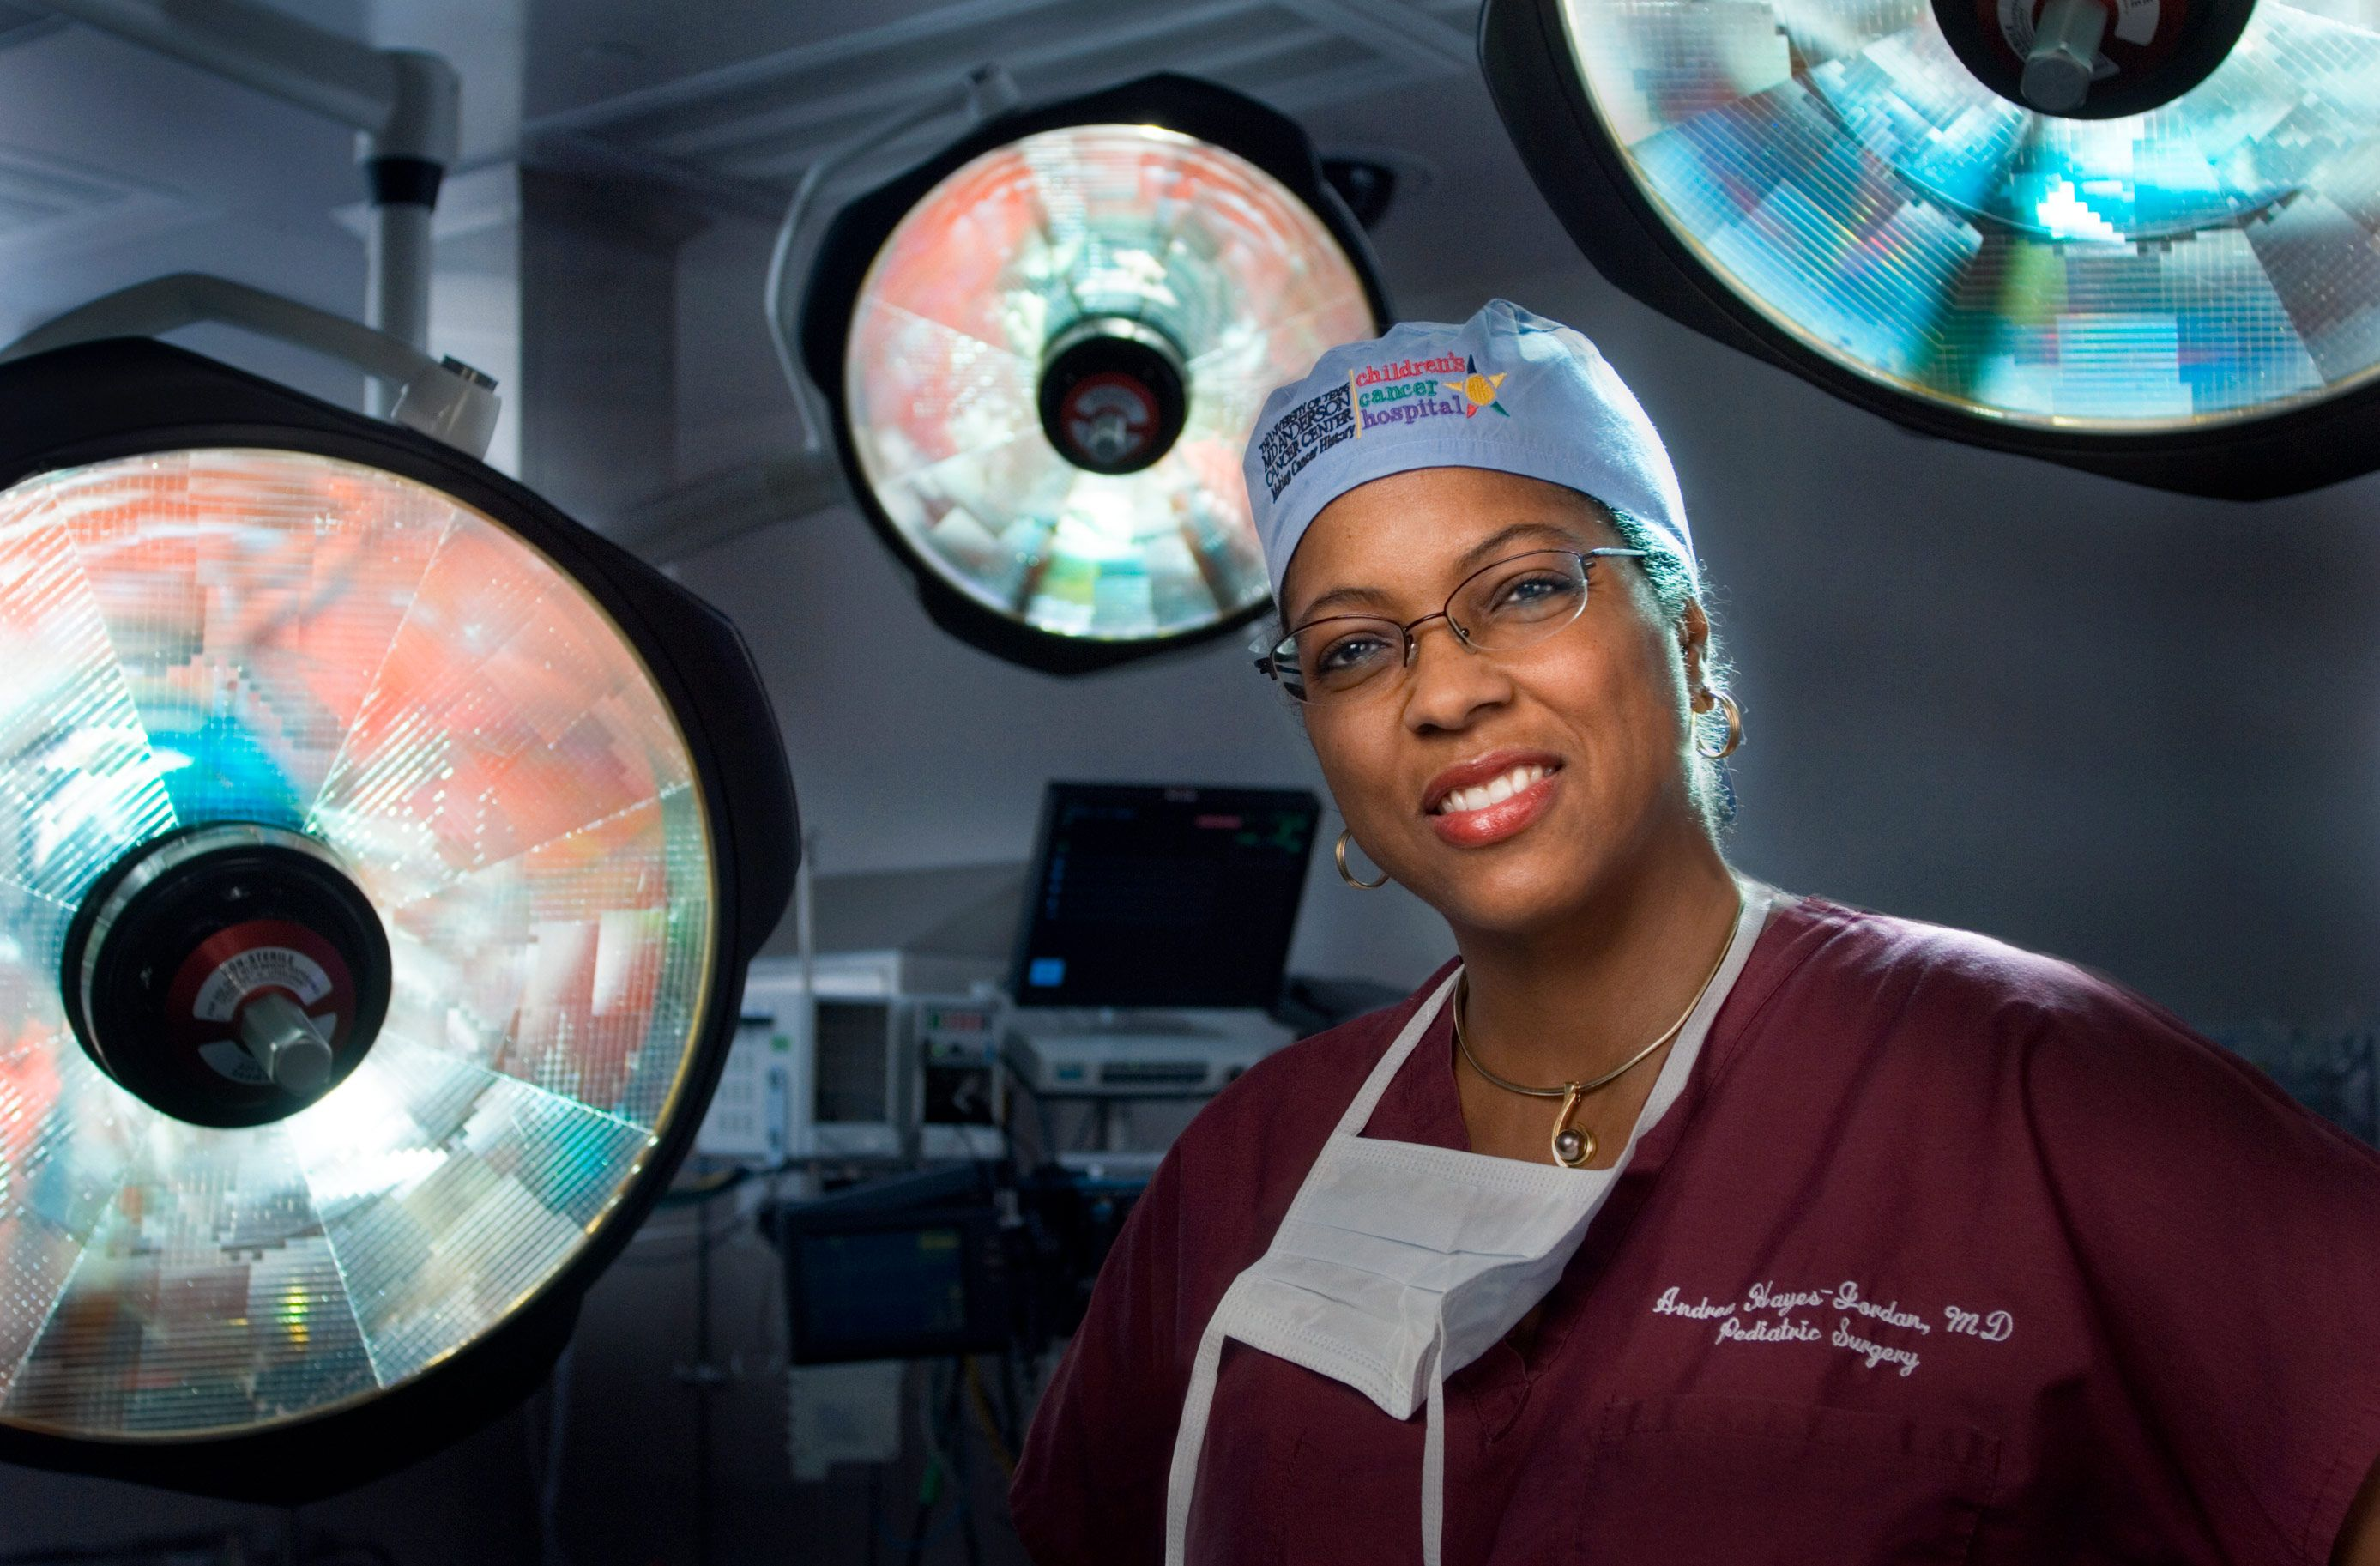 Dr. Jordan / MD Anderson